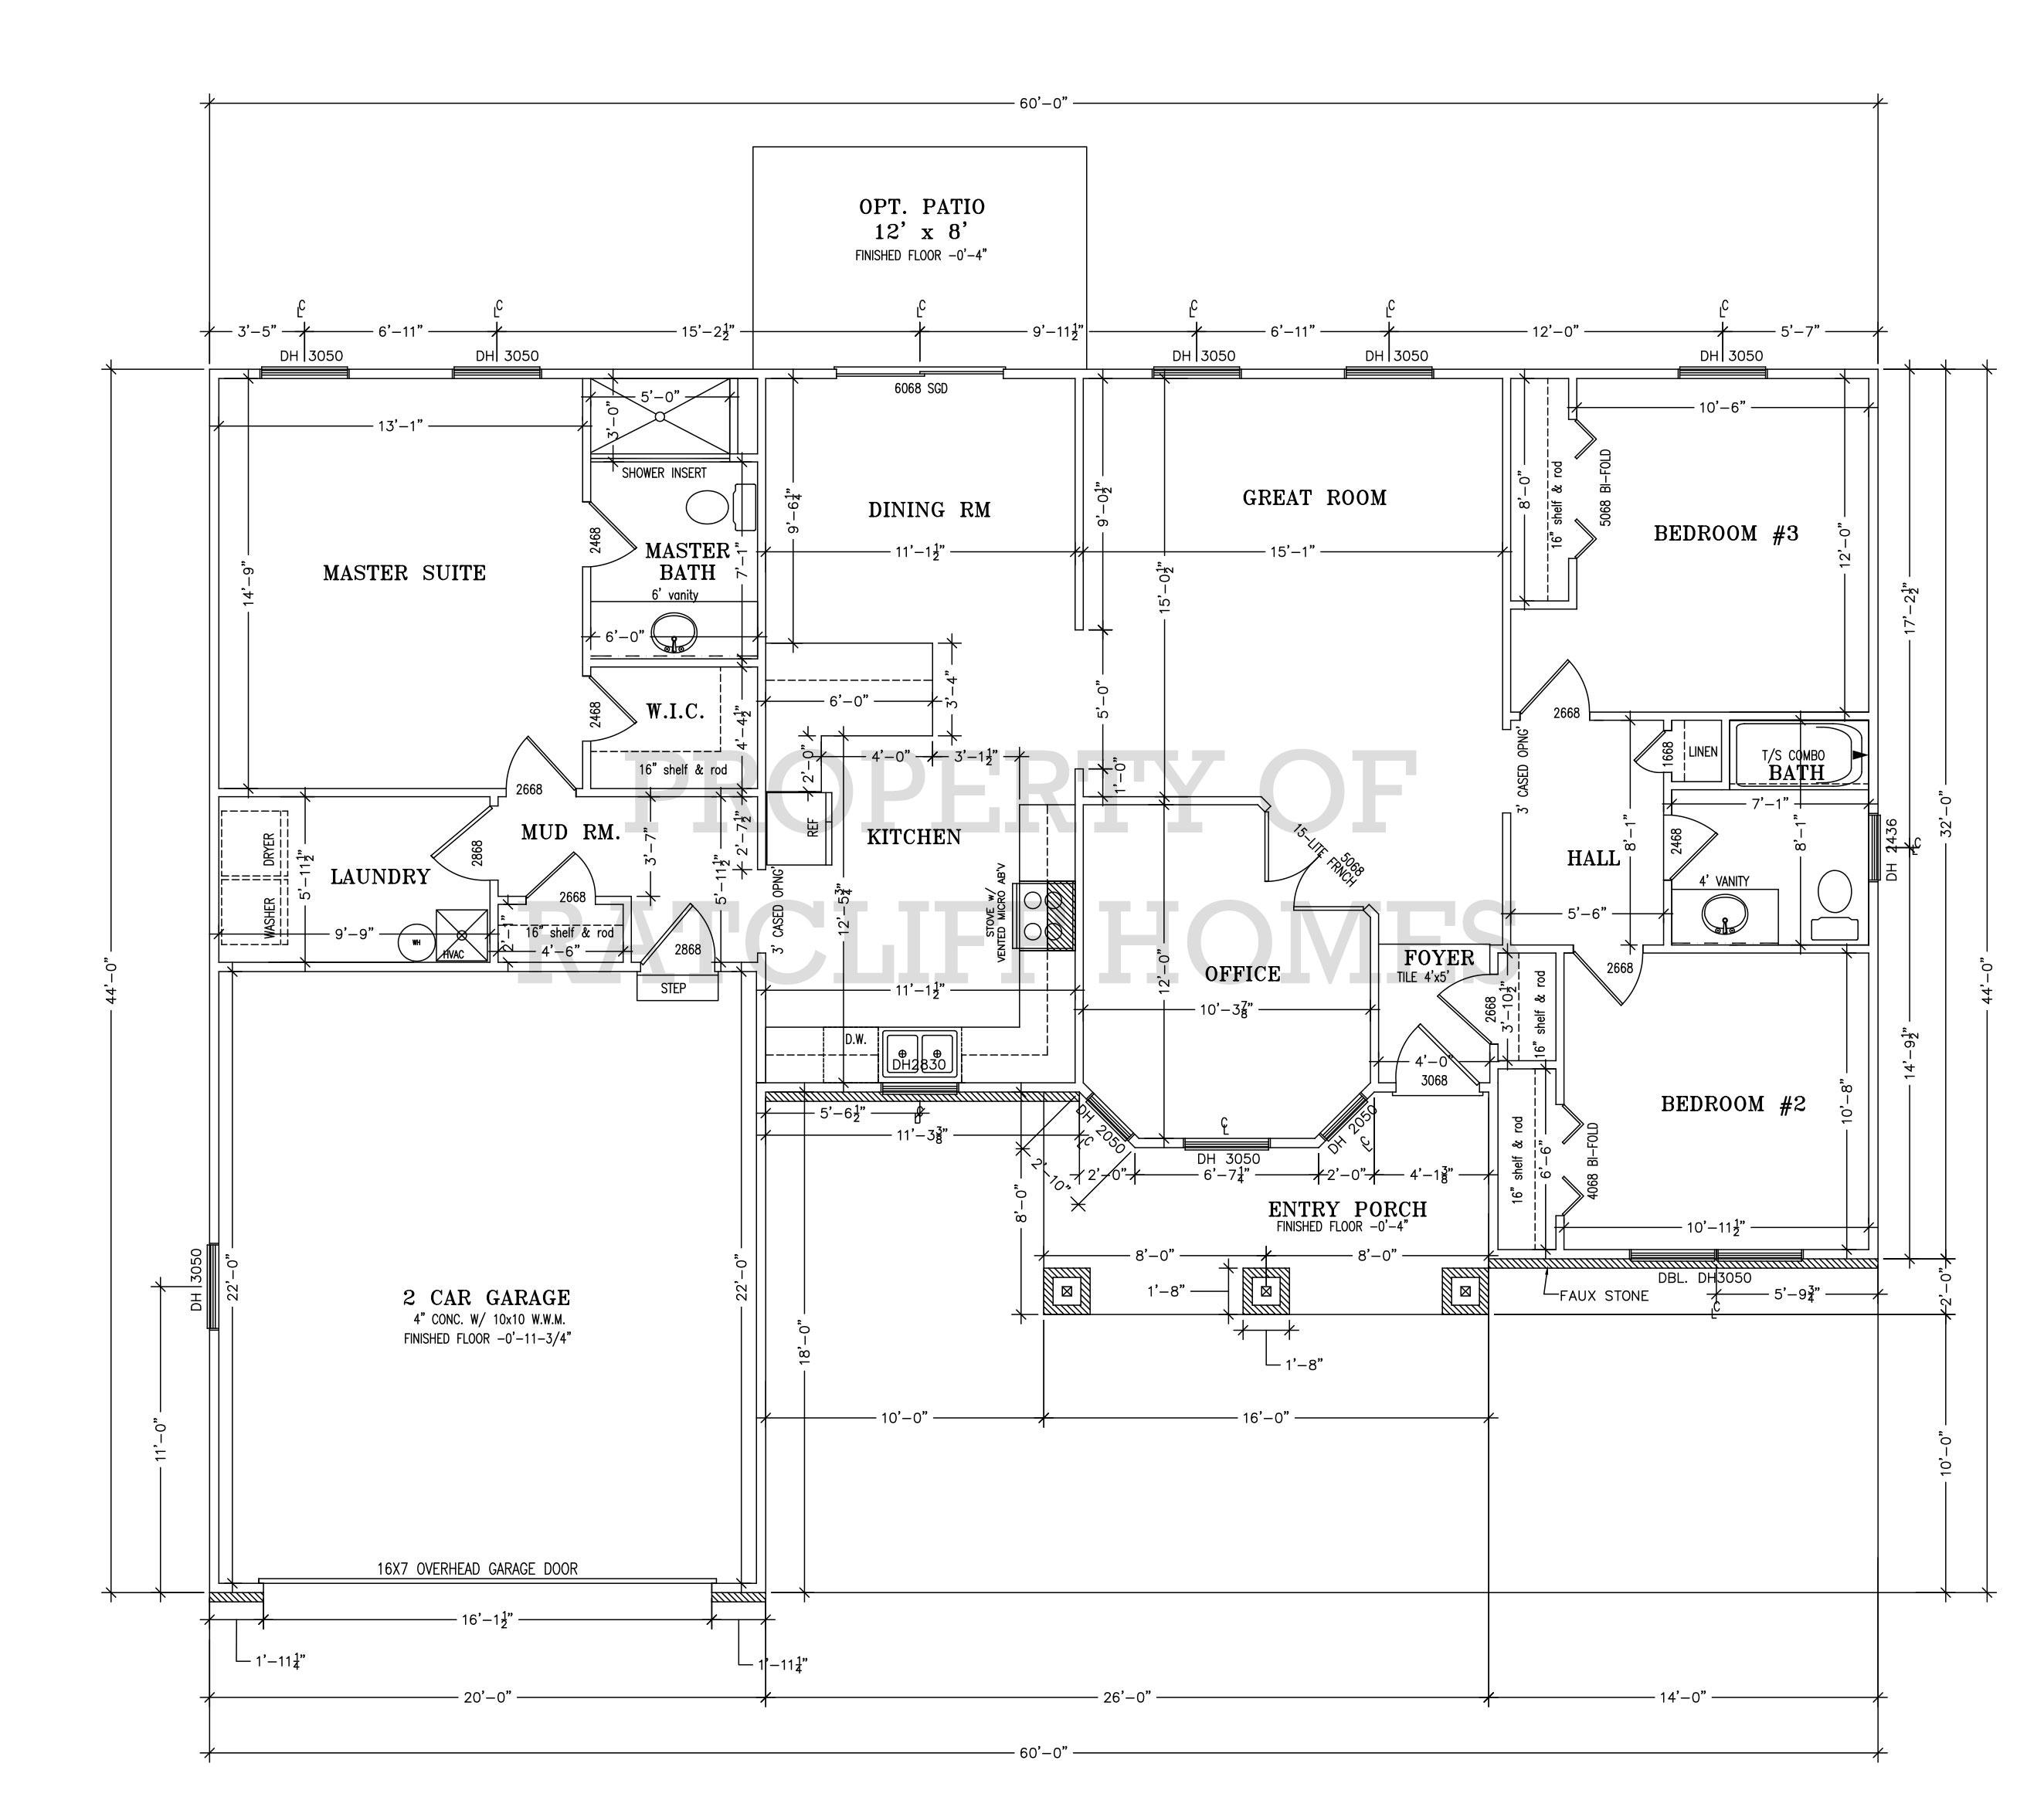 Dogwood floor plan